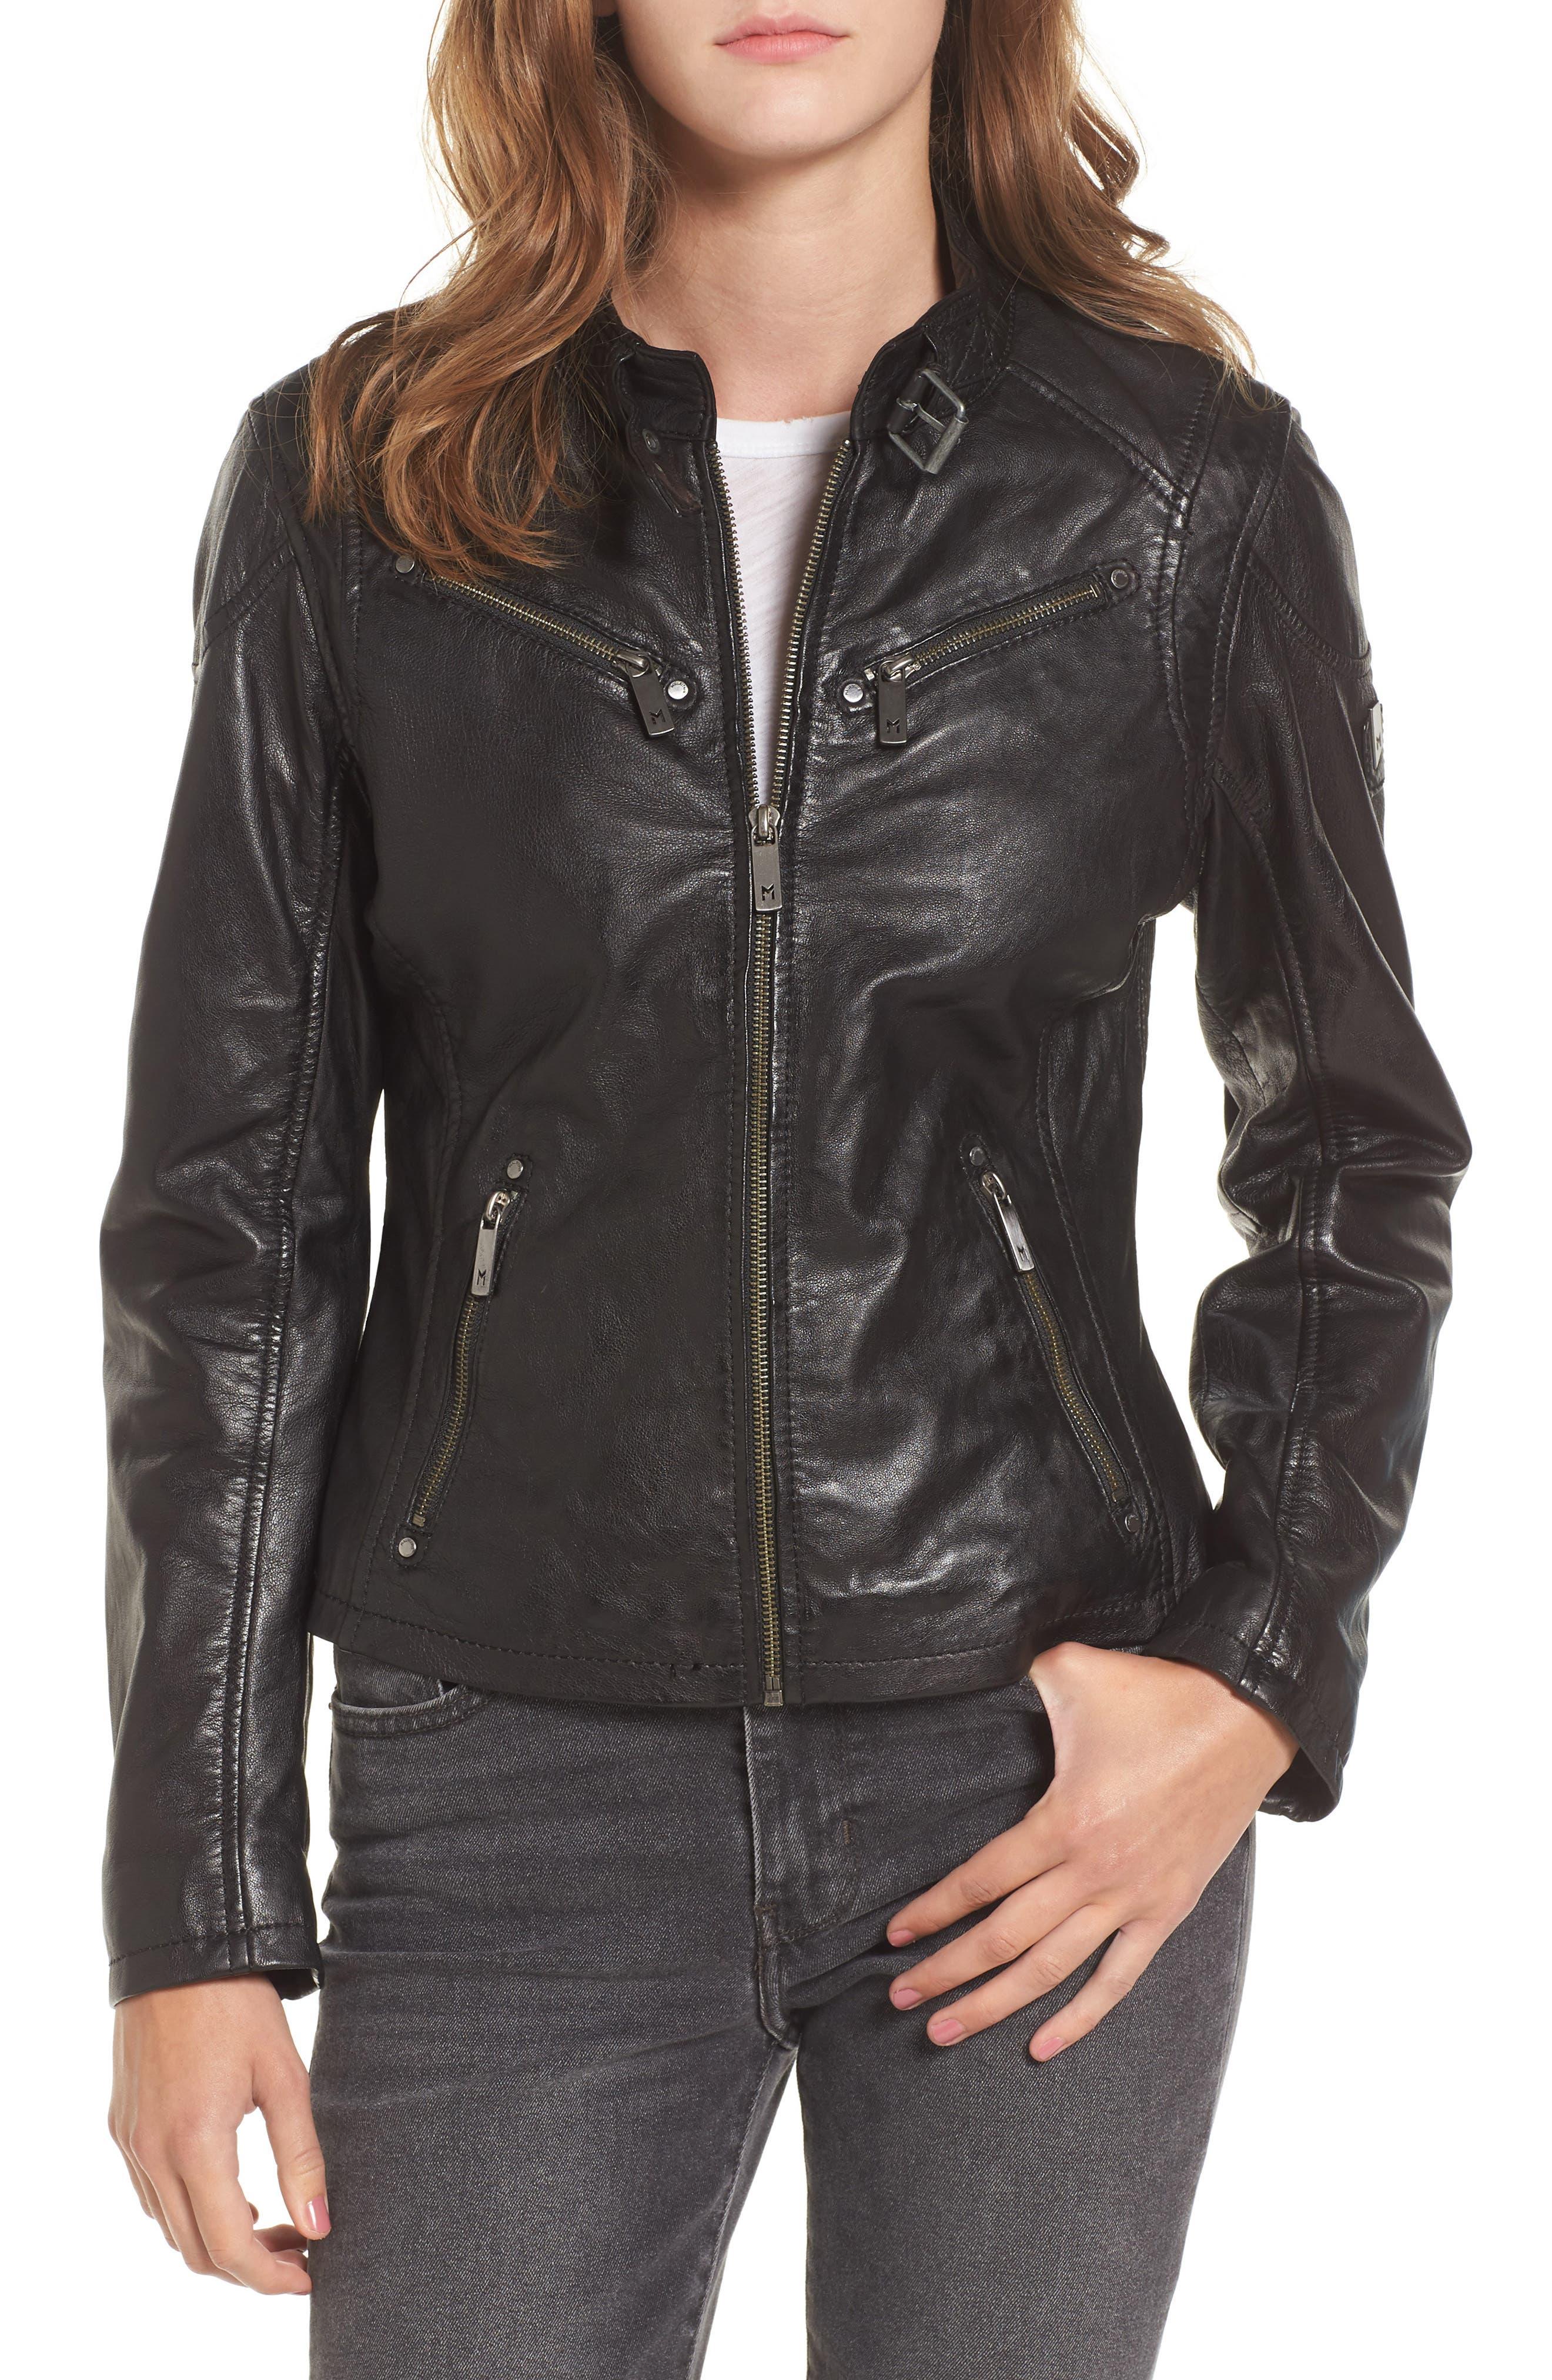 MAURITIUS Leather Lambskin Leather Moto Jacket, Main, color, 001